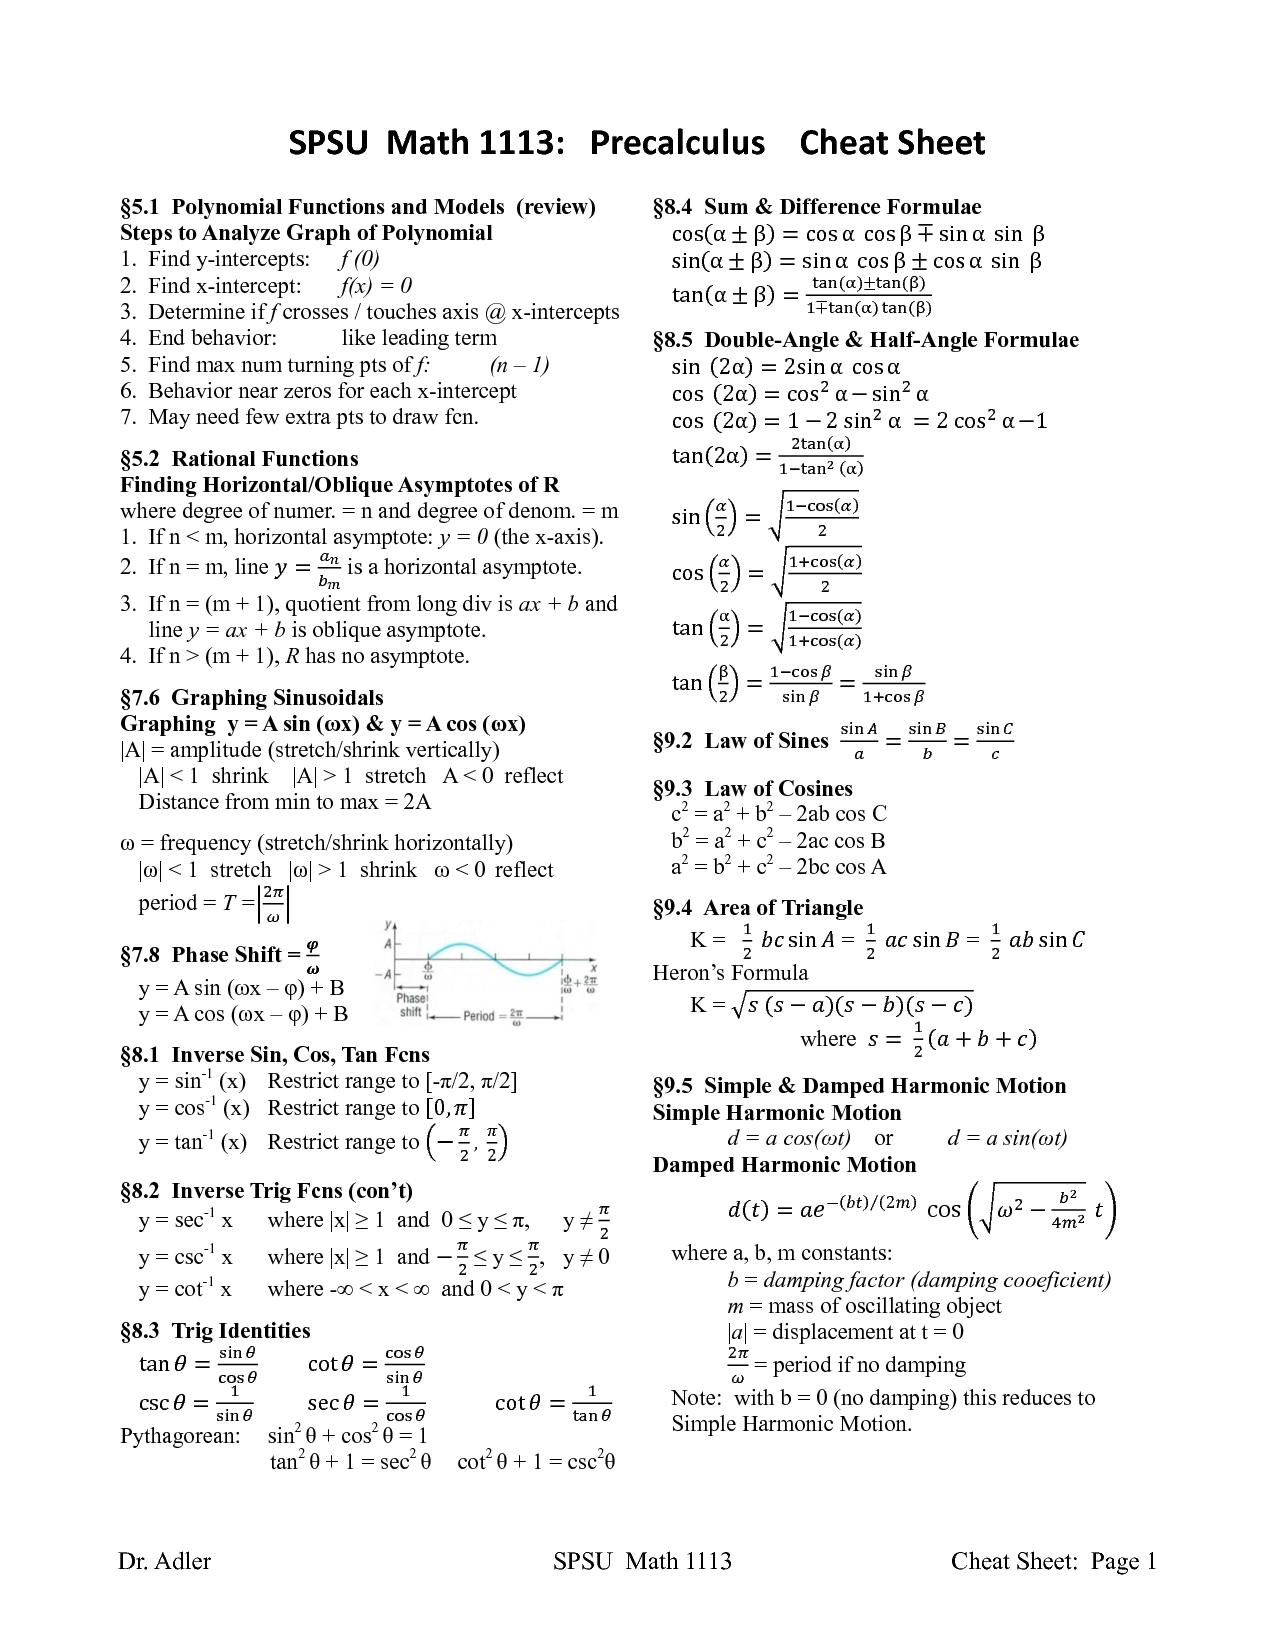 Math Worksheet Algebra 1 Formulas Cheat Sheet Worksheets For Kids Teachers Math Cheat Sheet For Algebra Math Cheat Sheet Algebra Equations College Algebra [ 1650 x 1275 Pixel ]